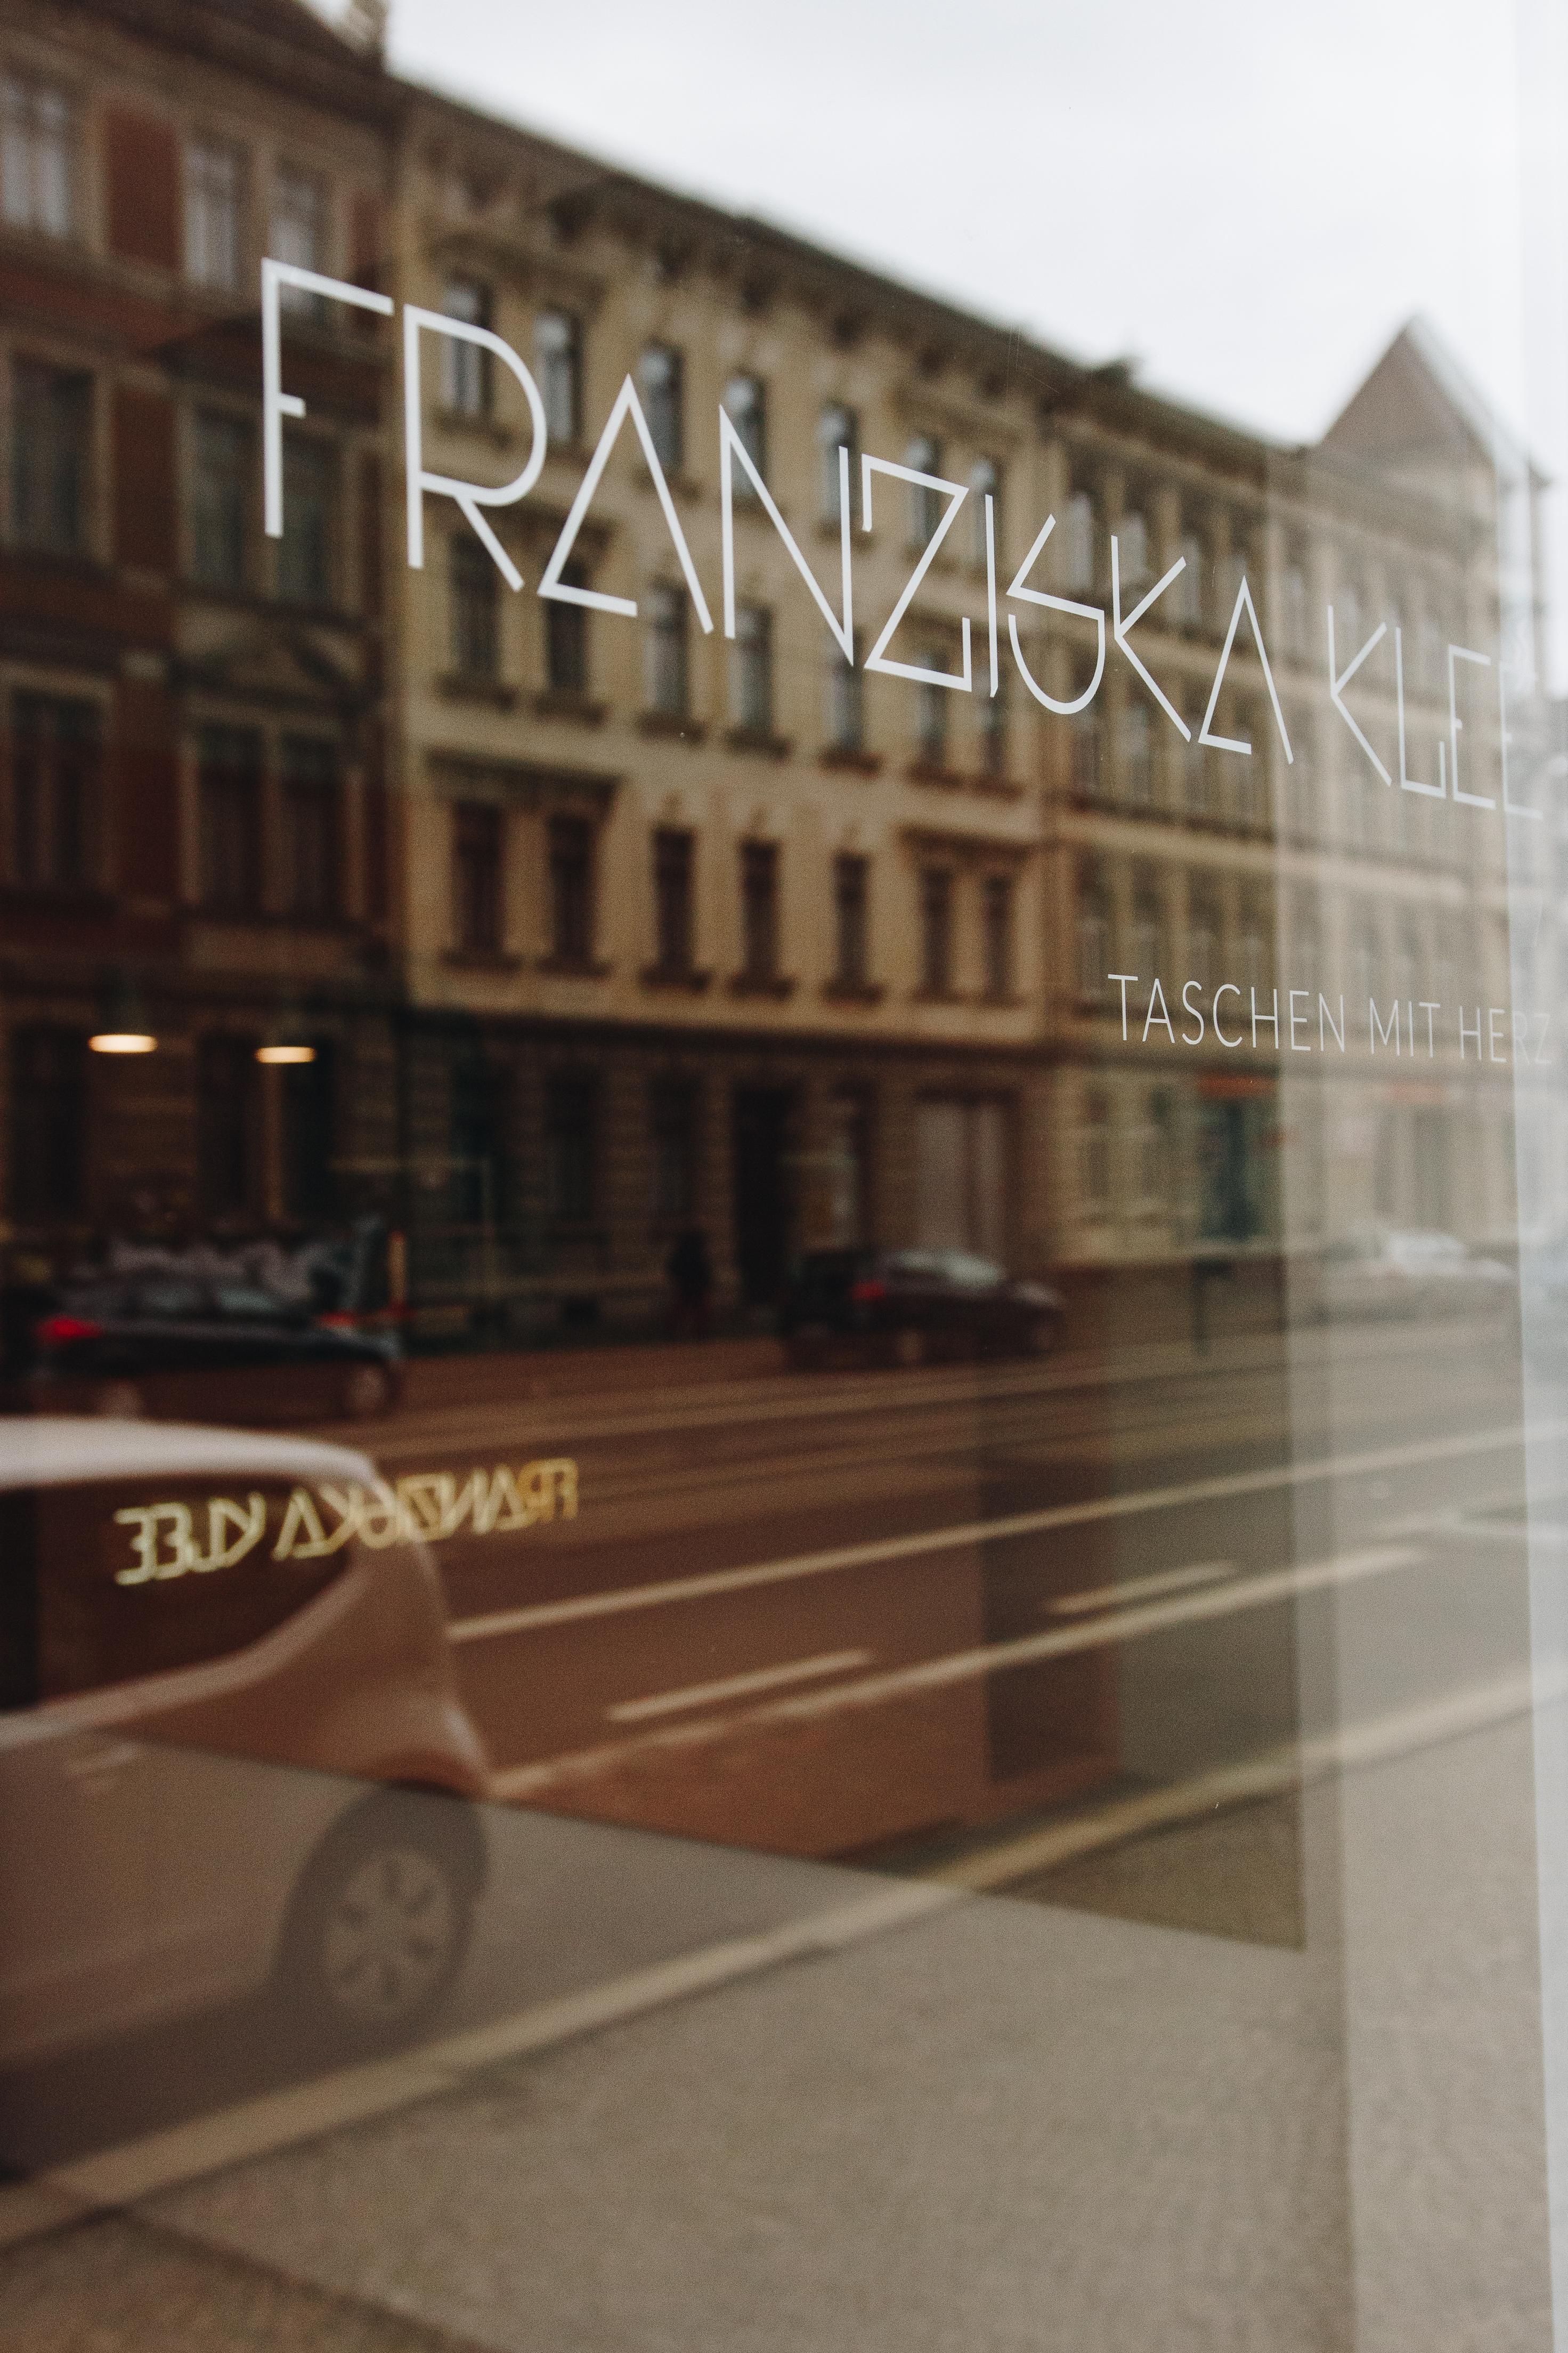 franziska klee-leipzig-annabelle sagt-design-label50